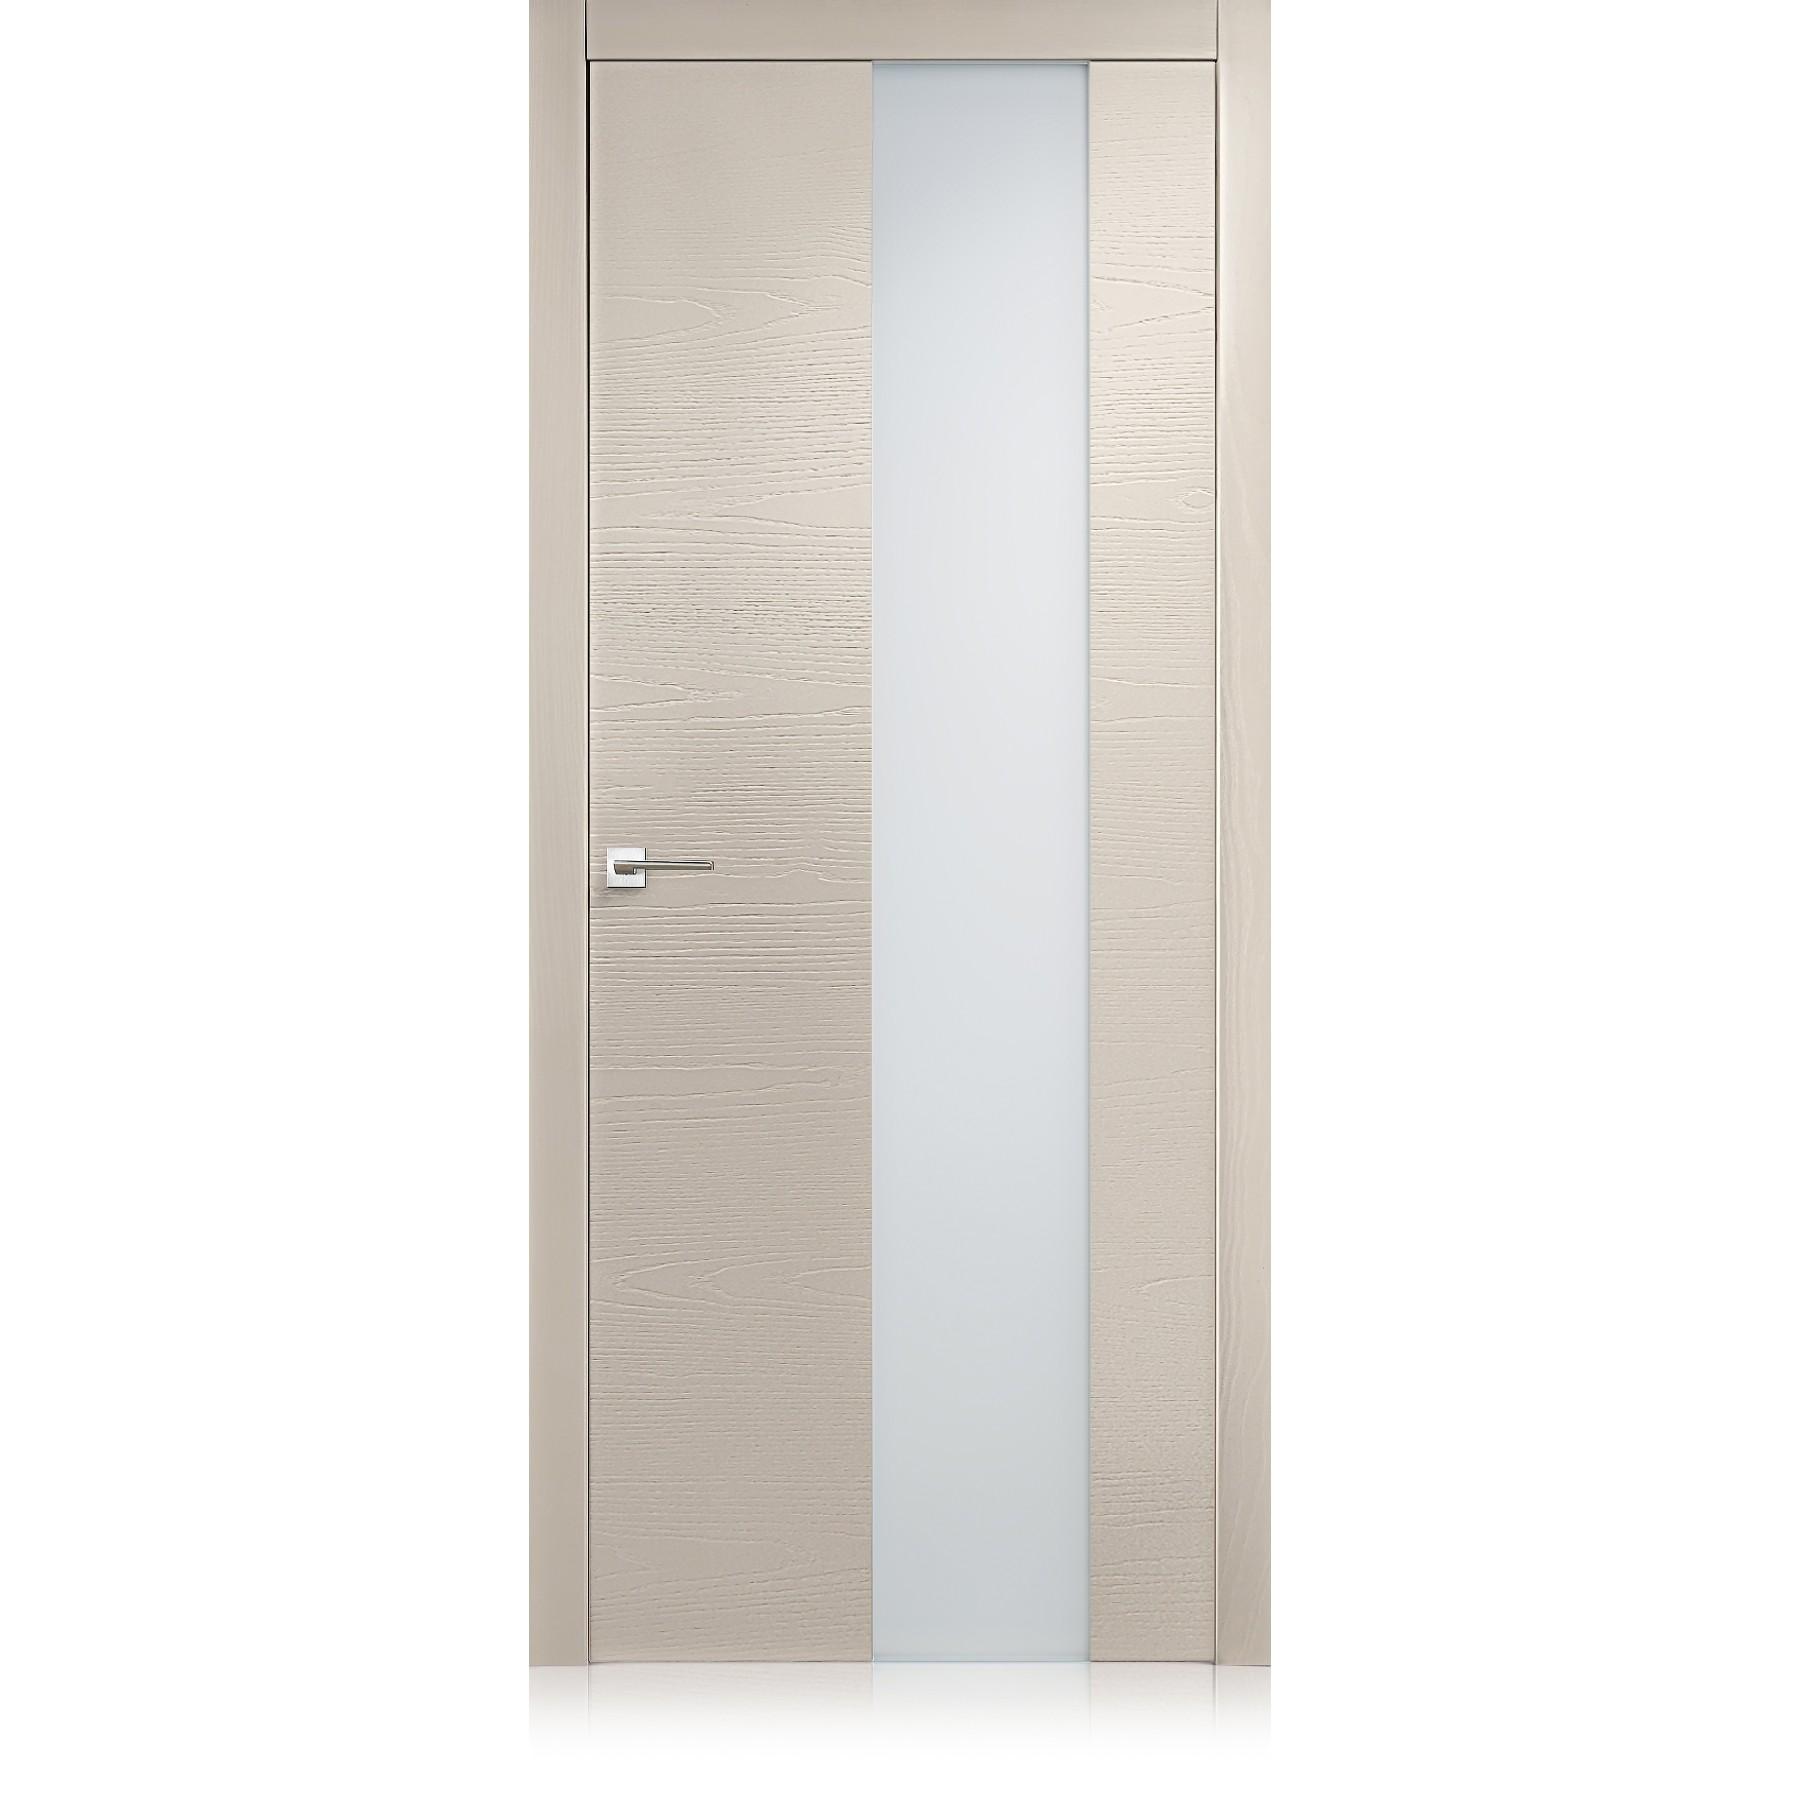 Equa vetro transparent / frosted glass door